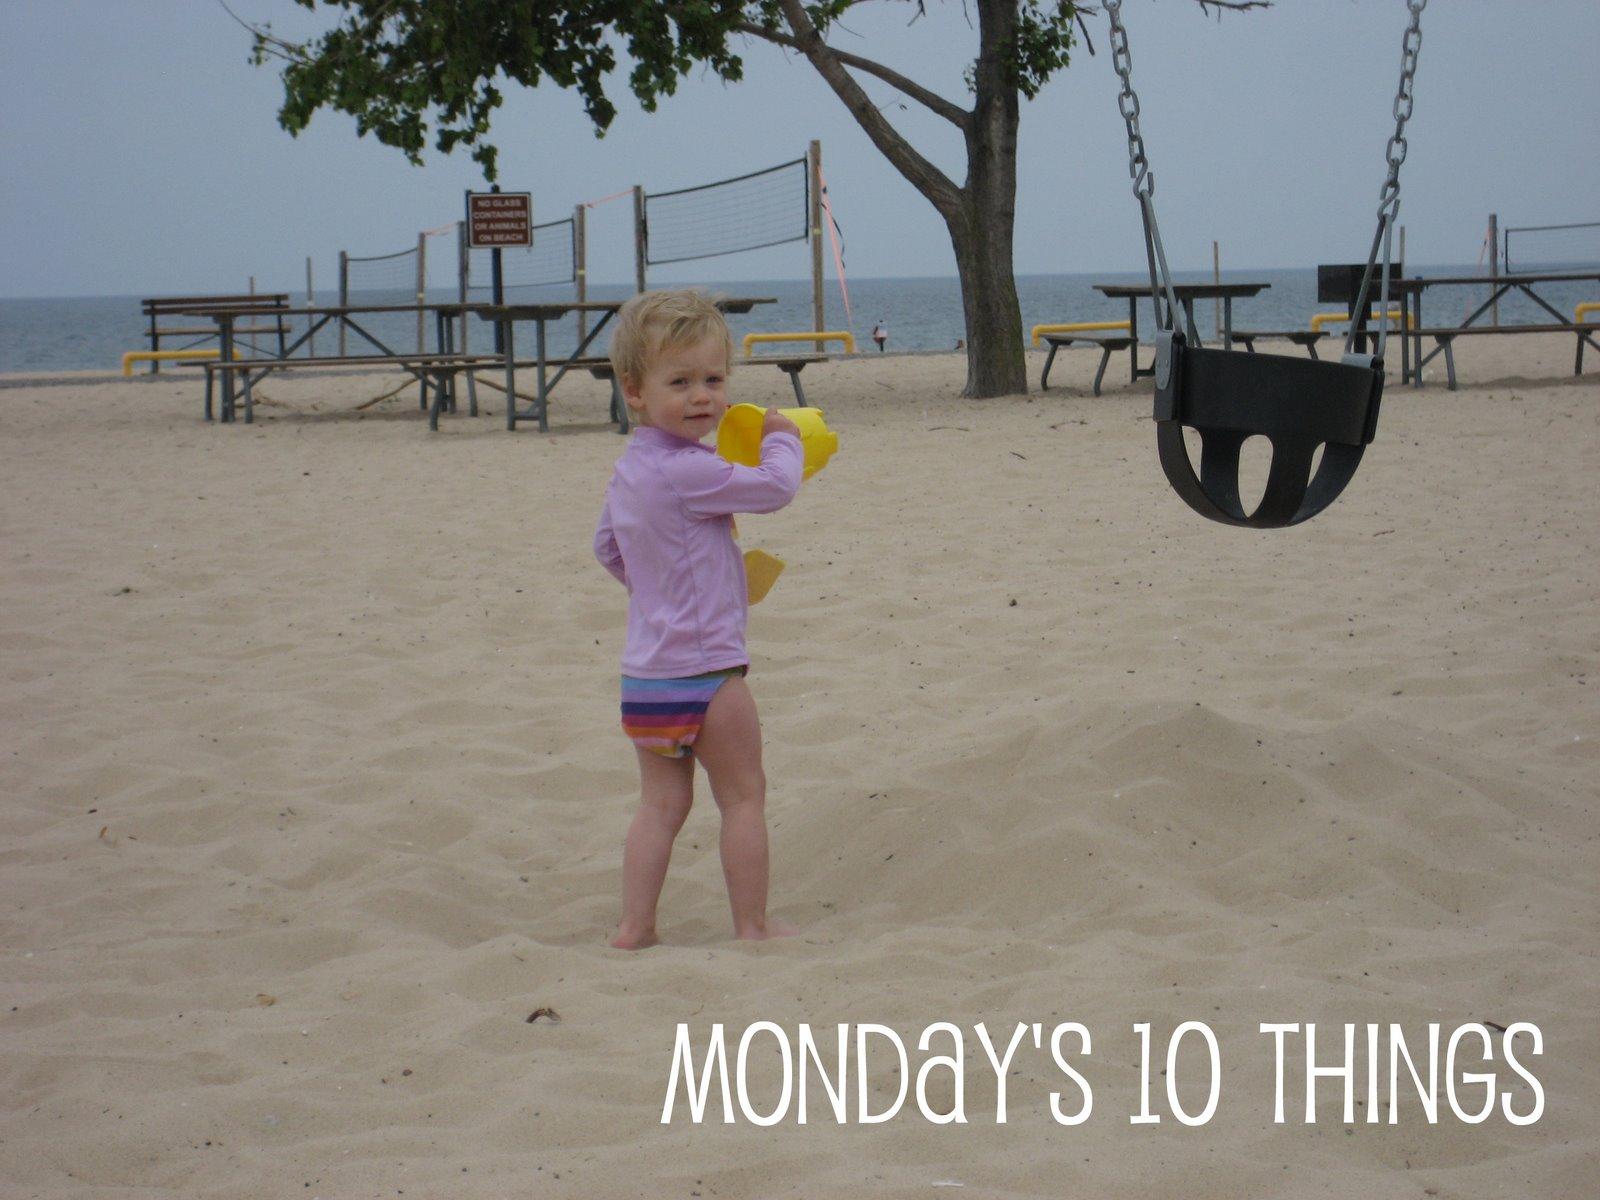 [Monday]